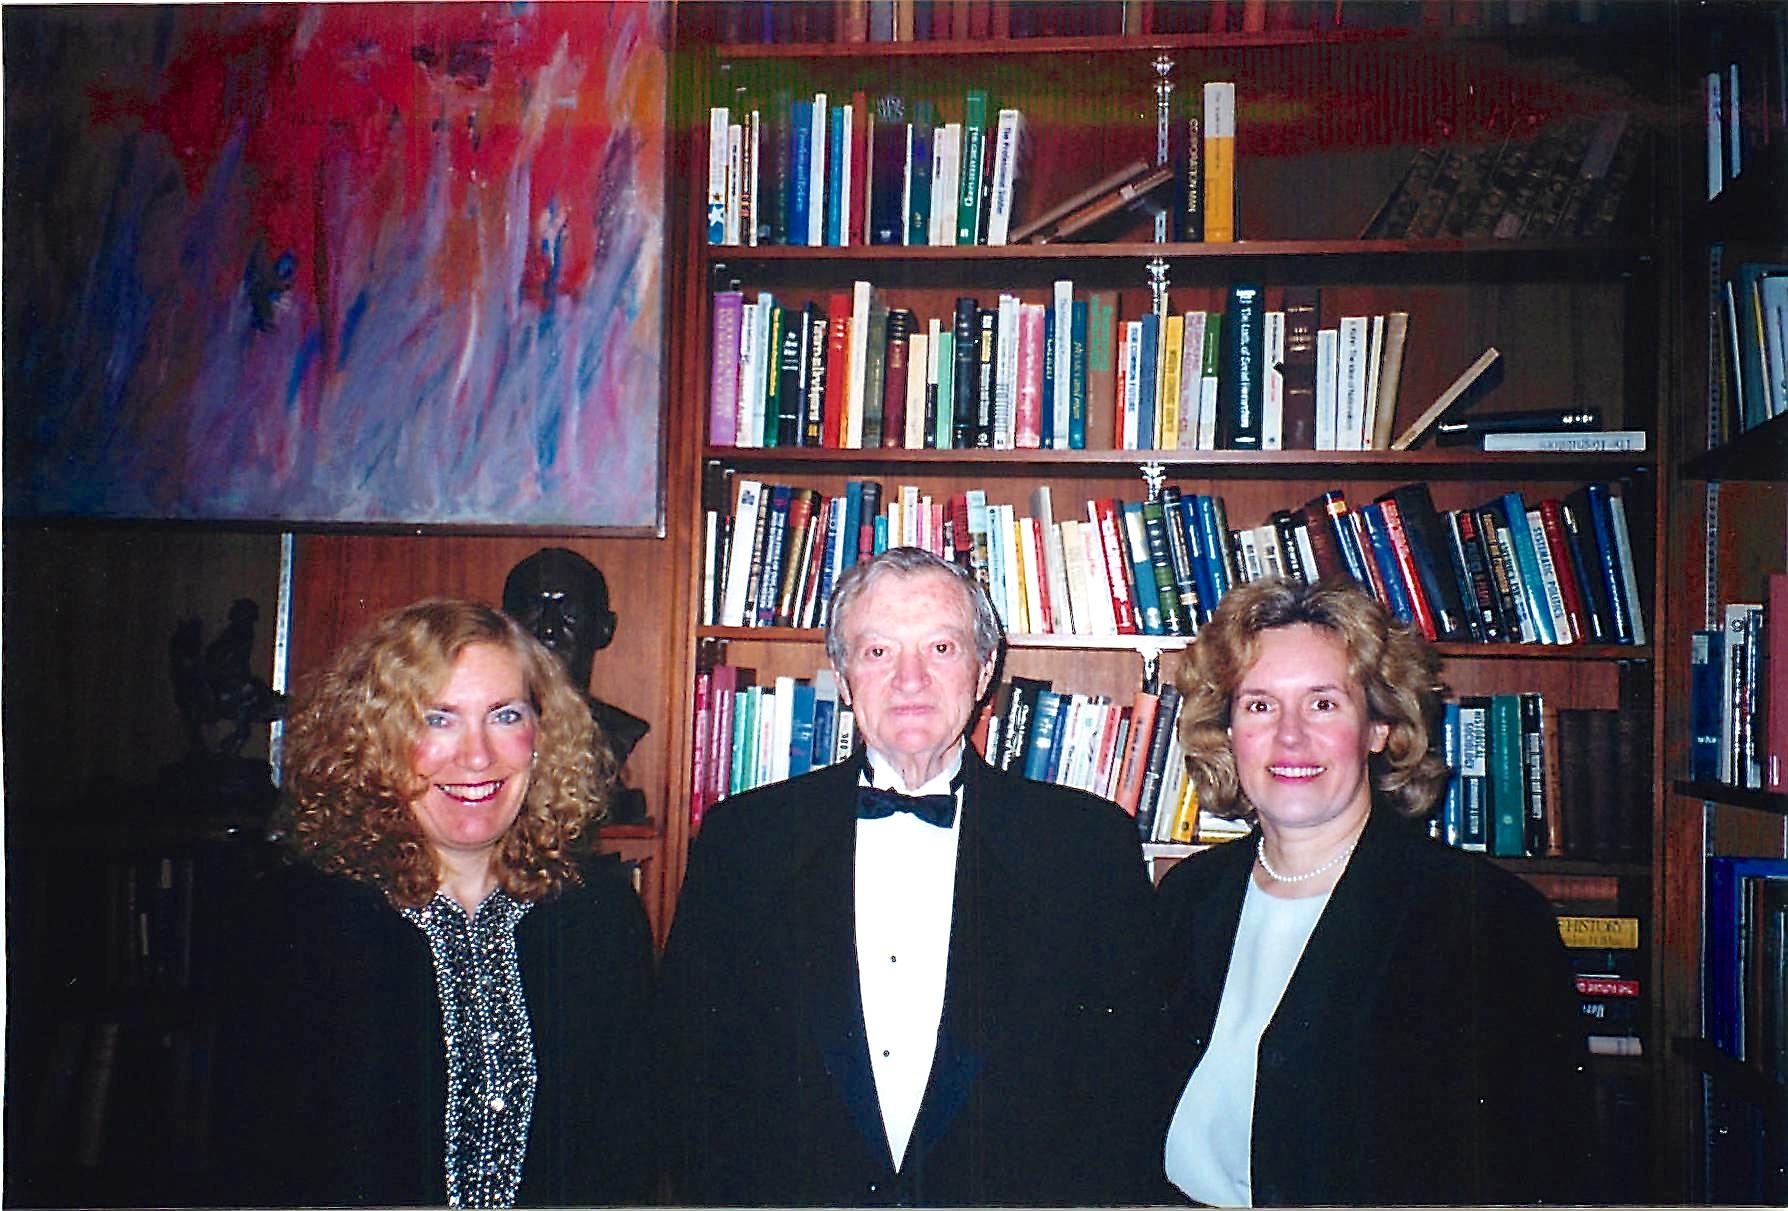 Elaine, Charles Gilvarg (her thesis advisor at Princeton) & Lorraine Gudas 1999 Harvey Lecture NYC